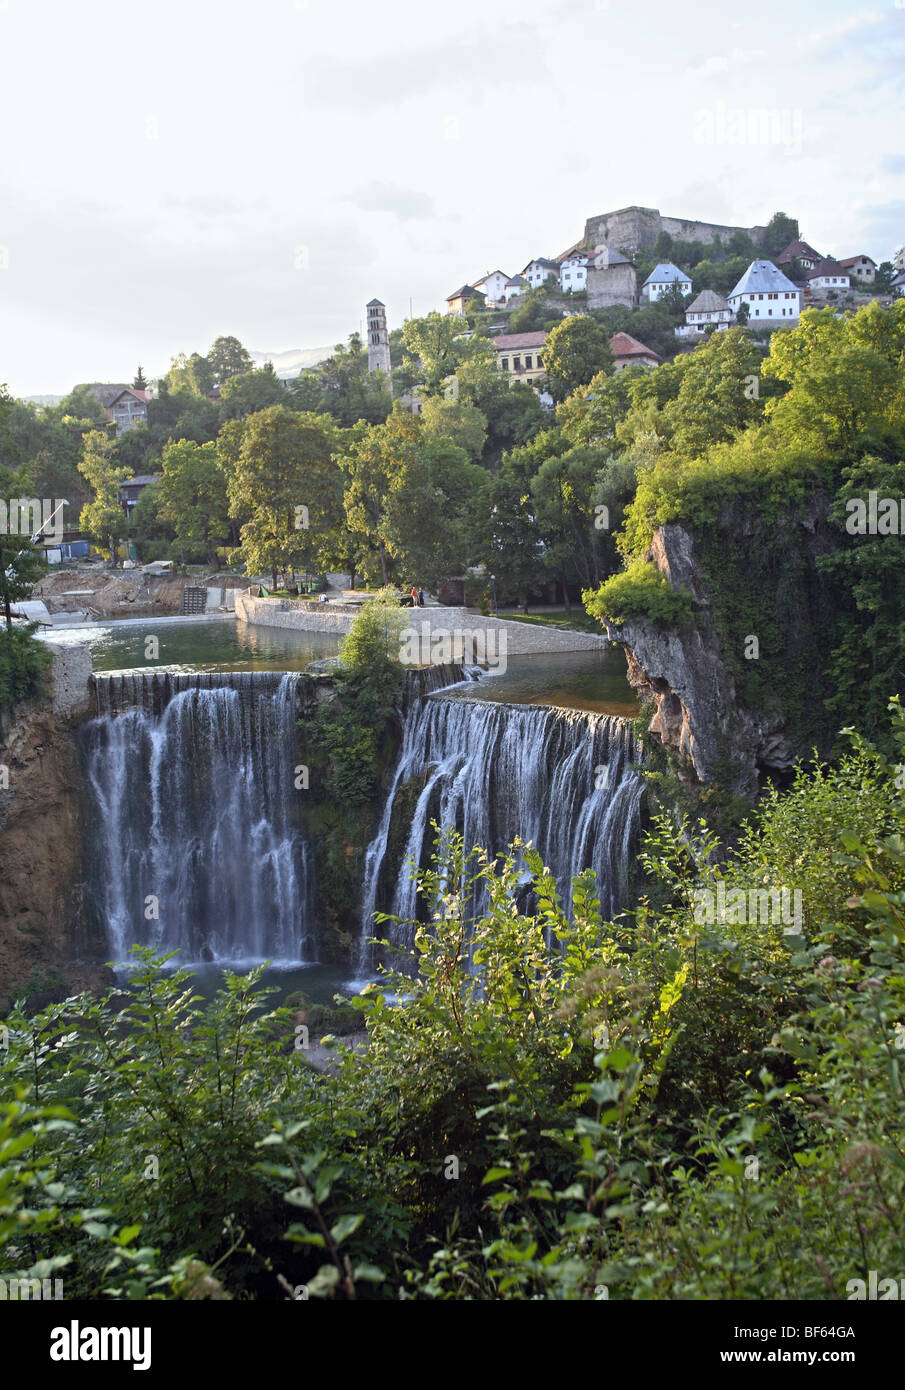 Jajce, Bosnia and Herzegovina, Pliva river waterfall - Stock Image